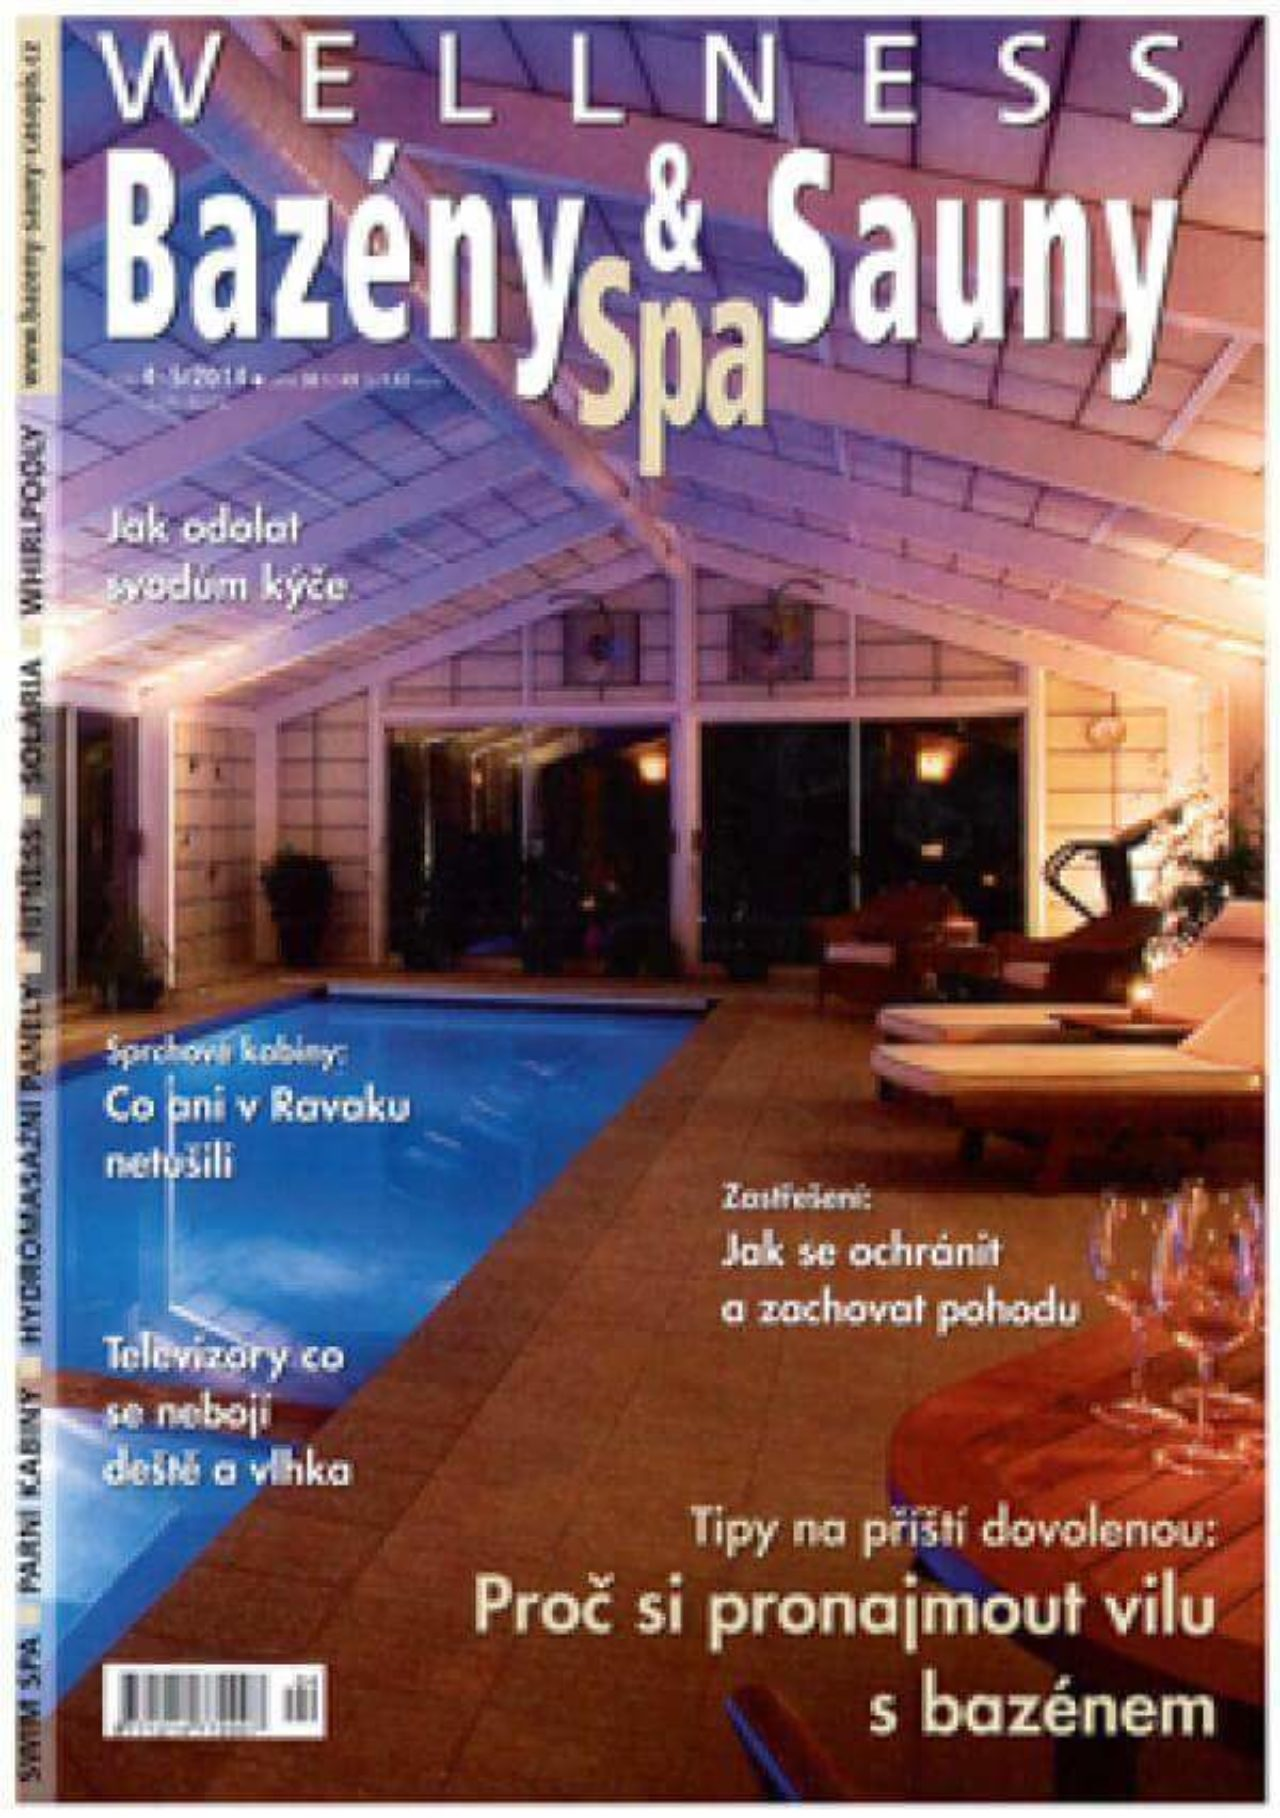 Bazény, Spa & Sauny 4-5/2014 | Blog - Microwell